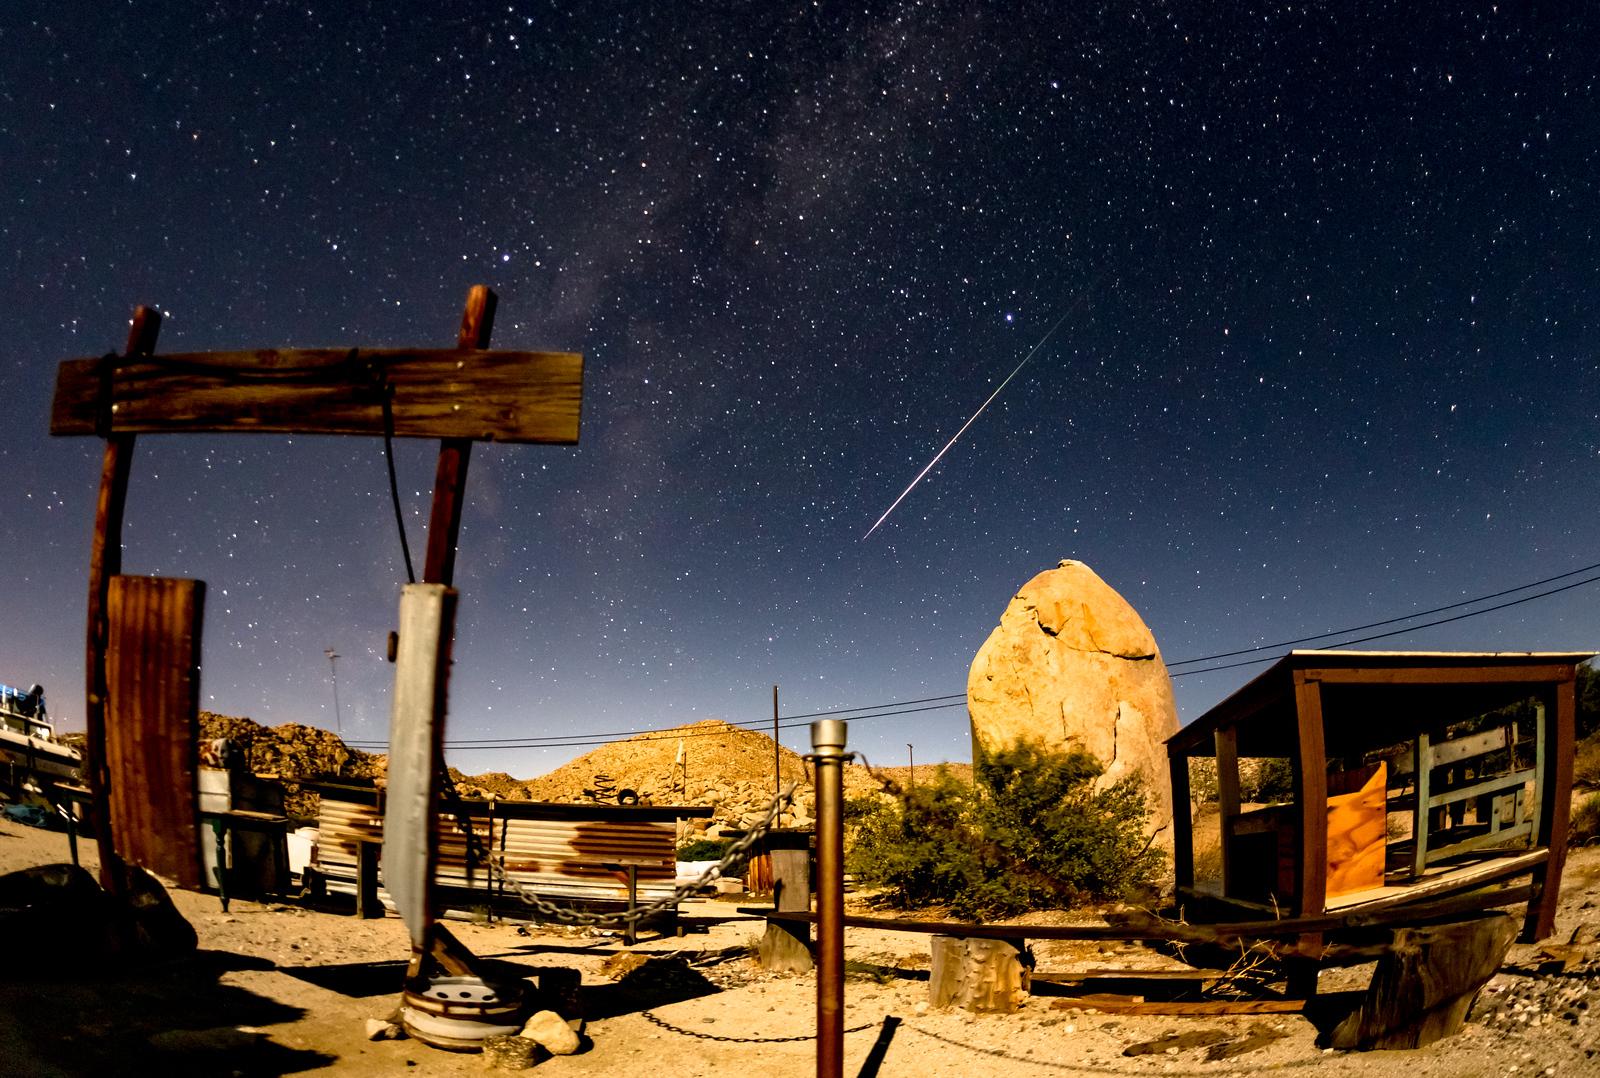 Perseid Meteor Over Coyote's Rattlesnake Saloon